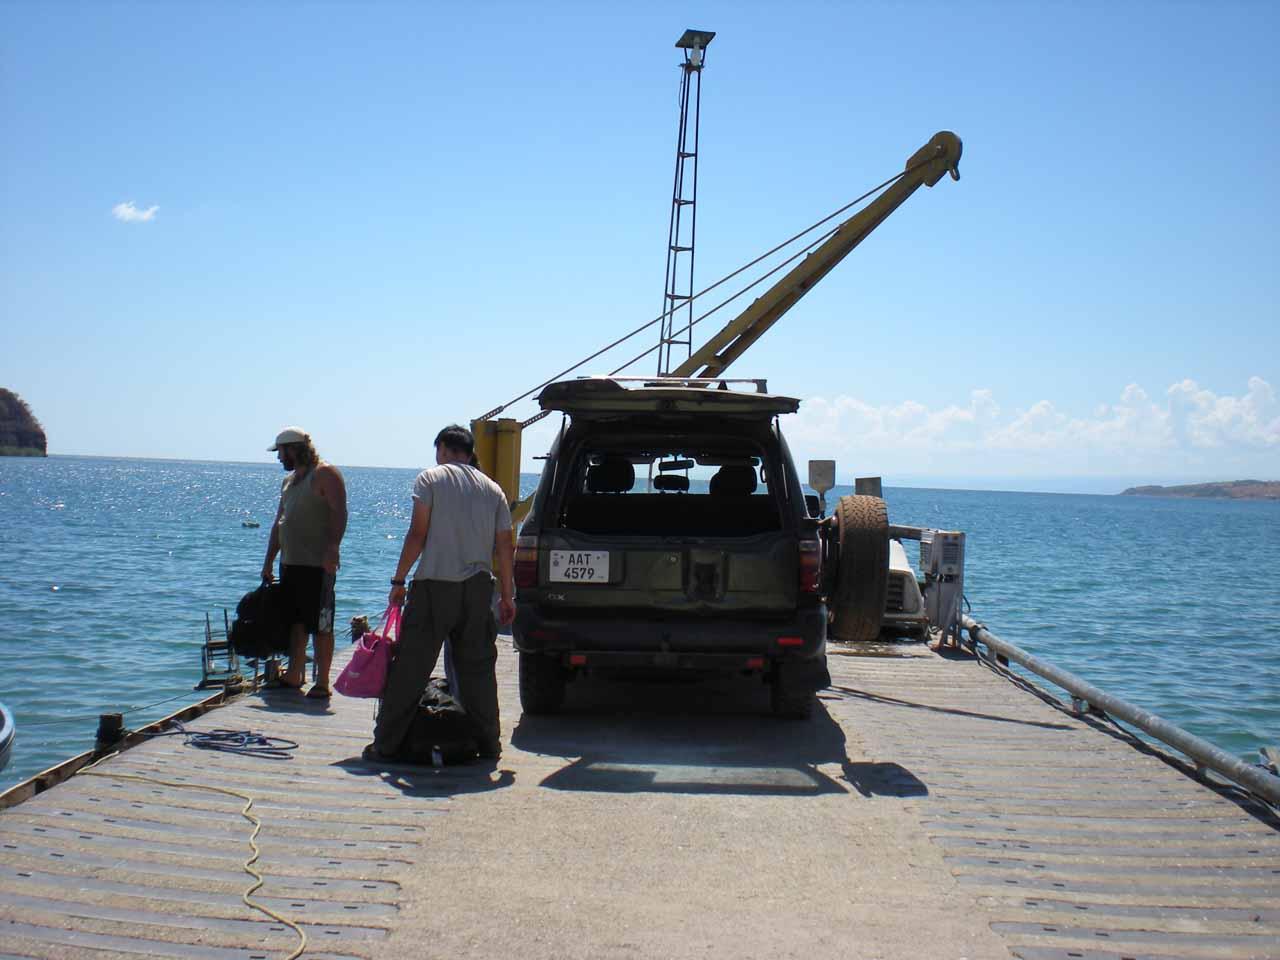 On the dock at Mpulungu